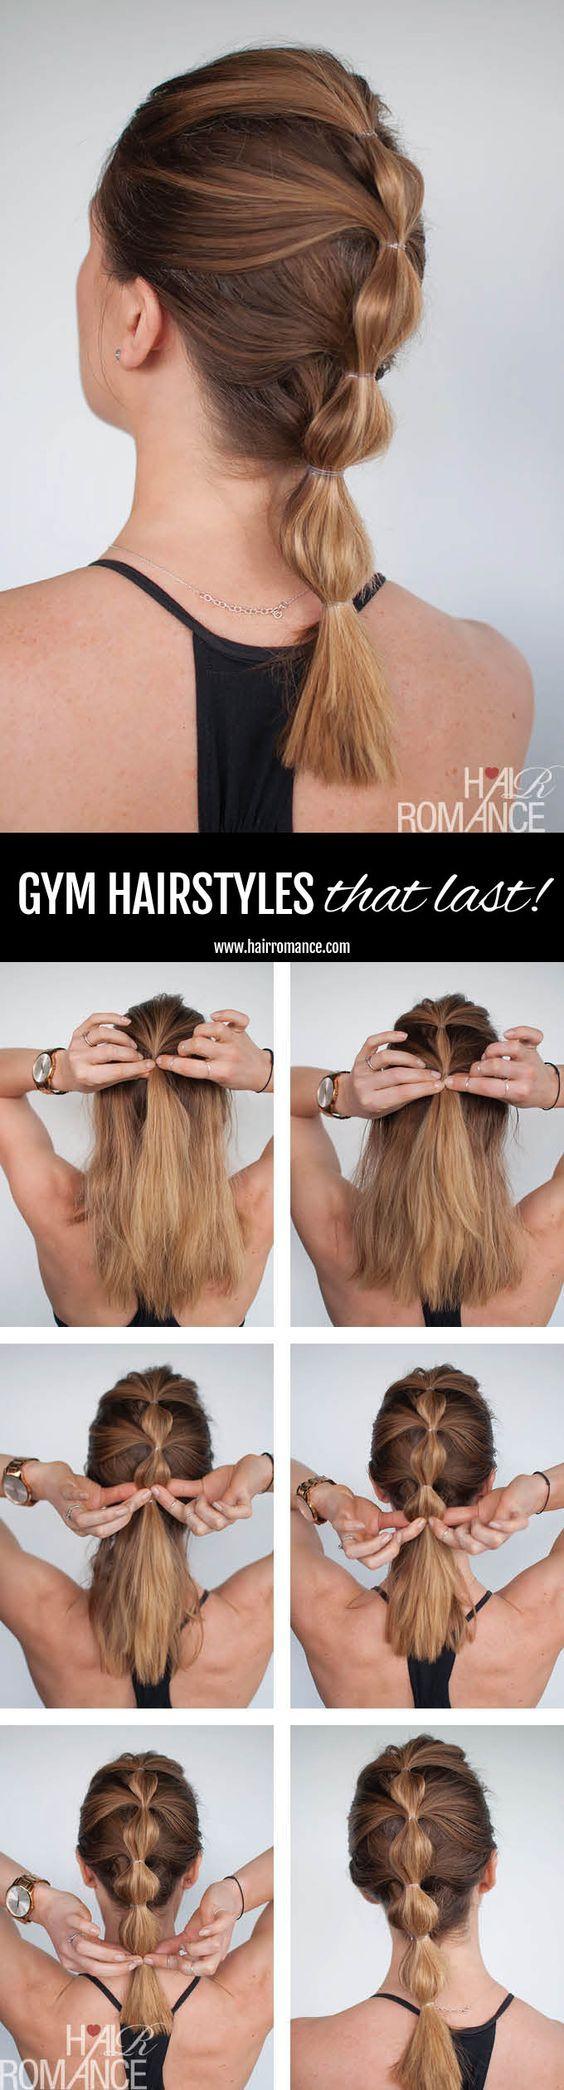 best yoga hair styles images on pinterest hairstyle ideas hair